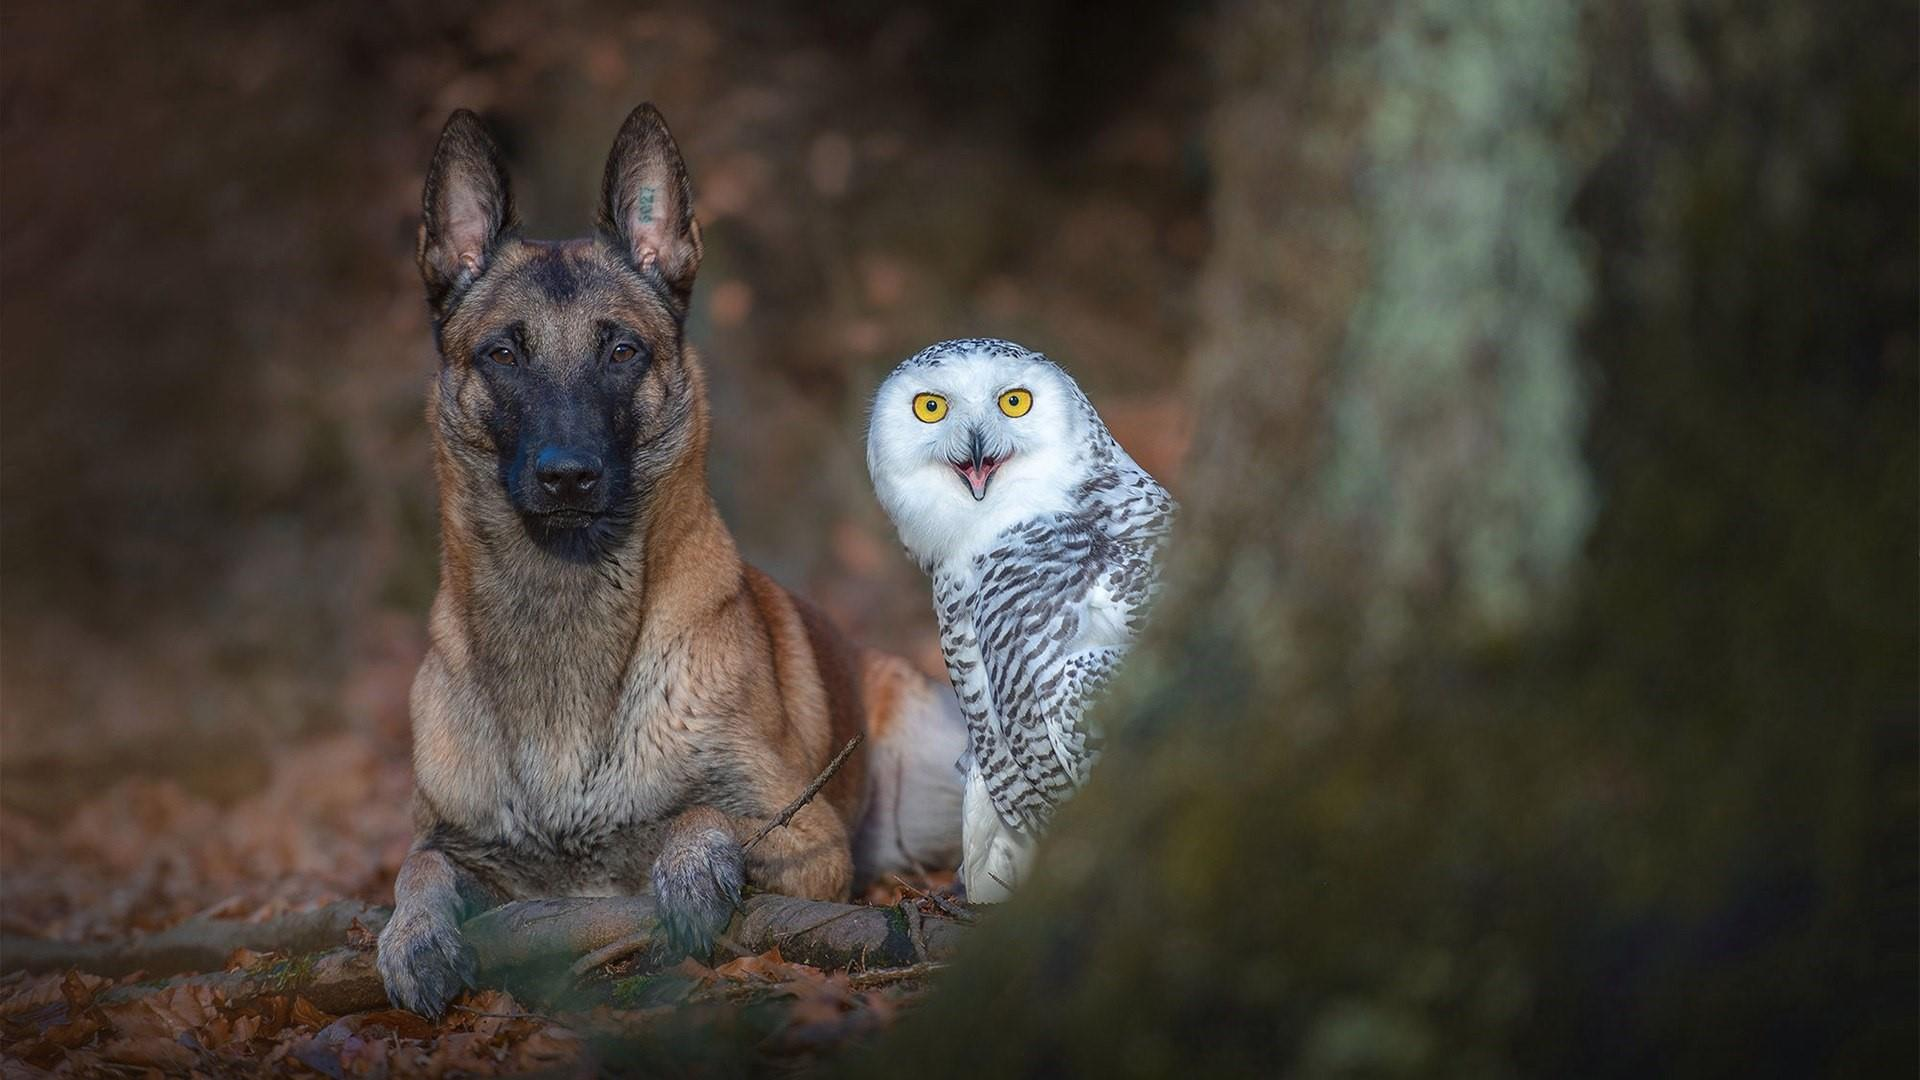 Malinois Belgian Shepherd dog with a white owl wallpaper